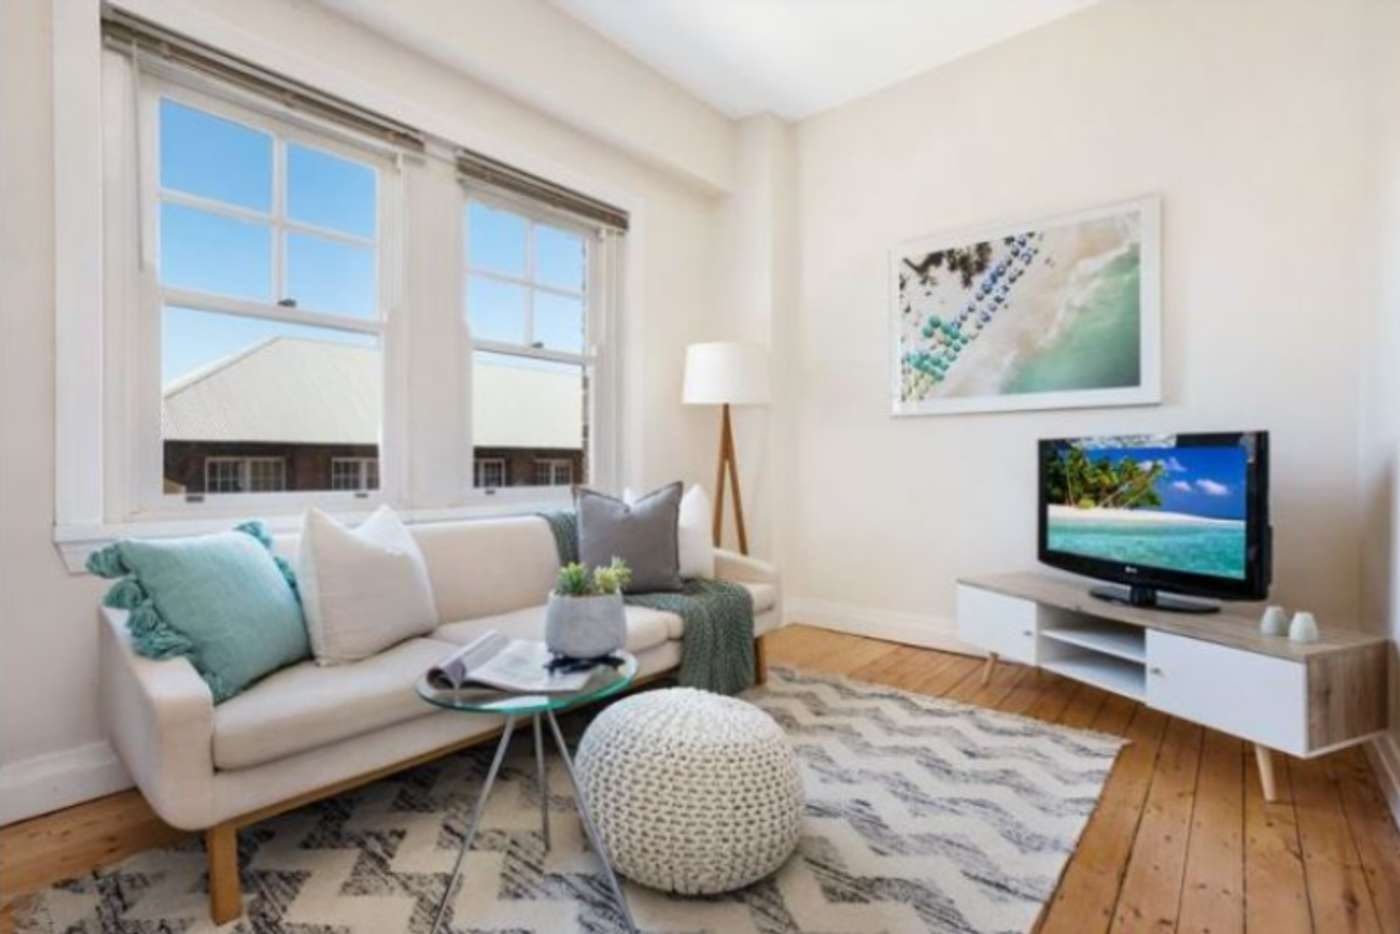 Main view of Homely unit listing, 27/1 Beach Road, Bondi Beach NSW 2026